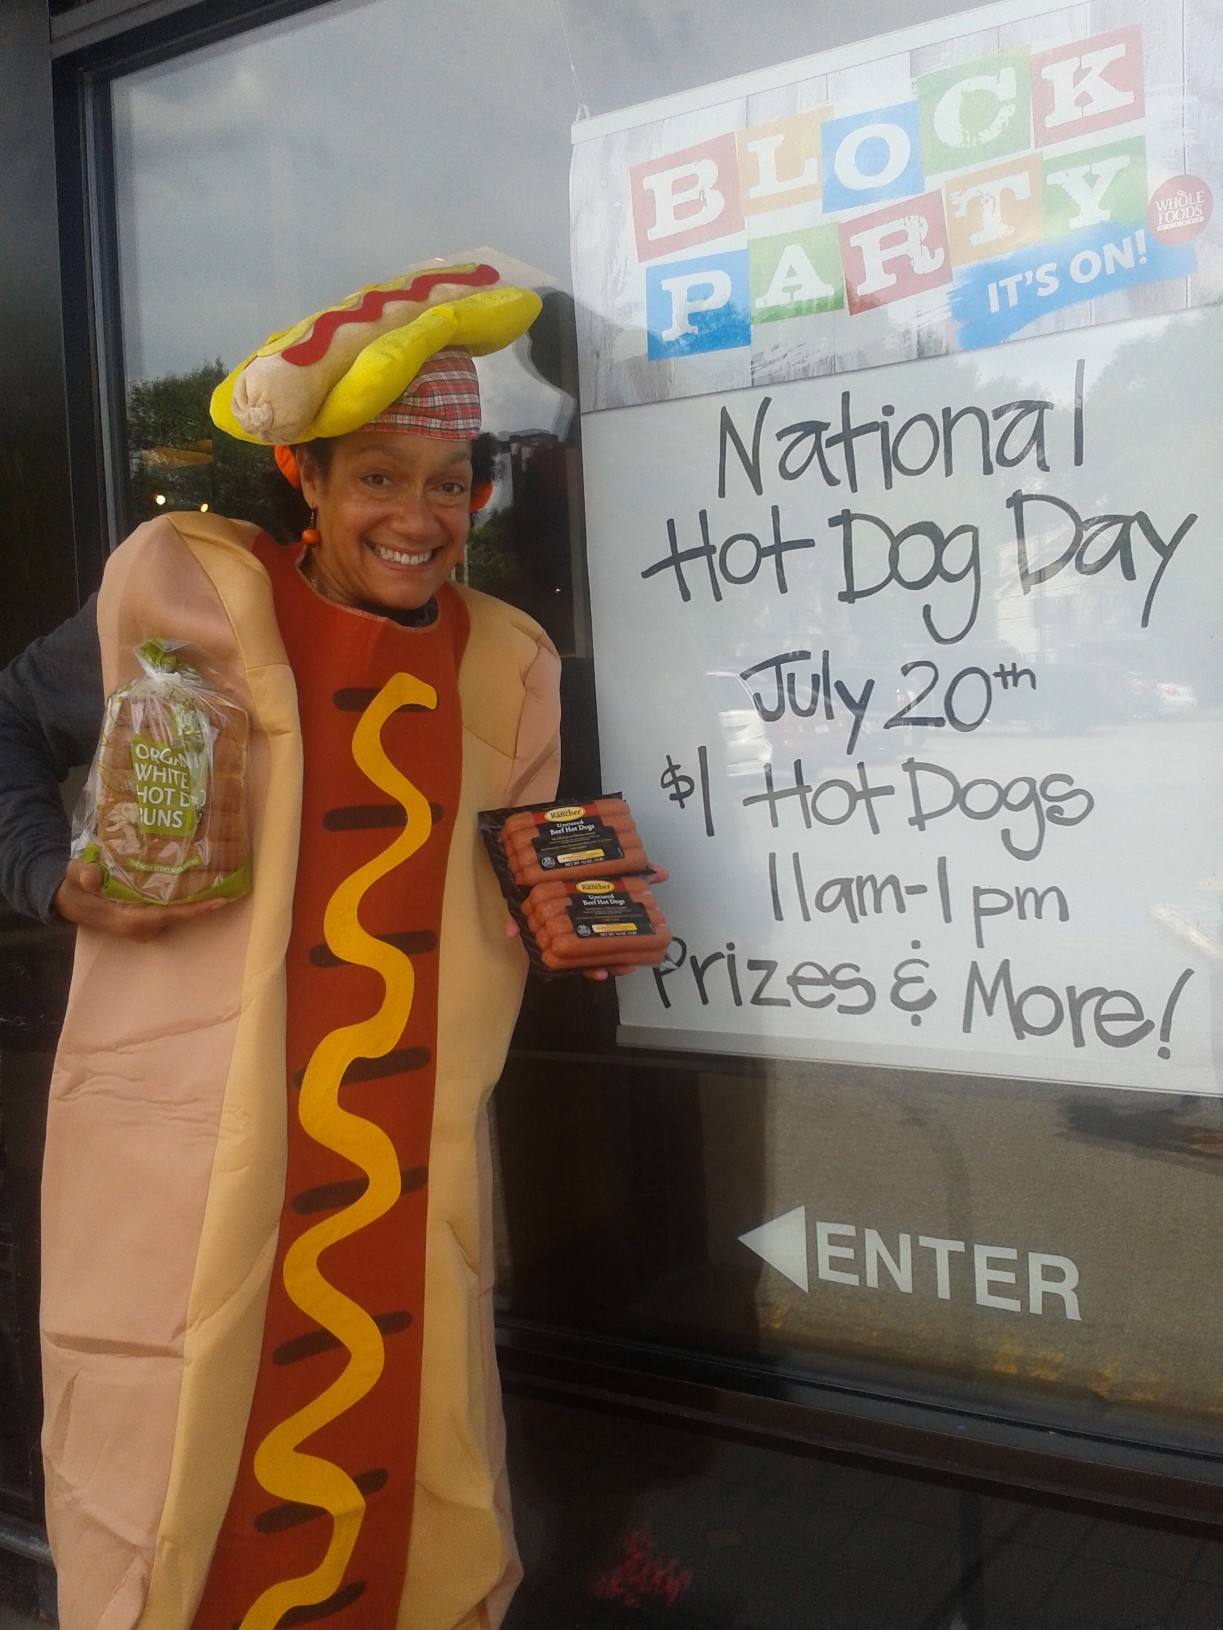 Hot Dog Throwdown Whole Foods Newton, National Hot Dog Day